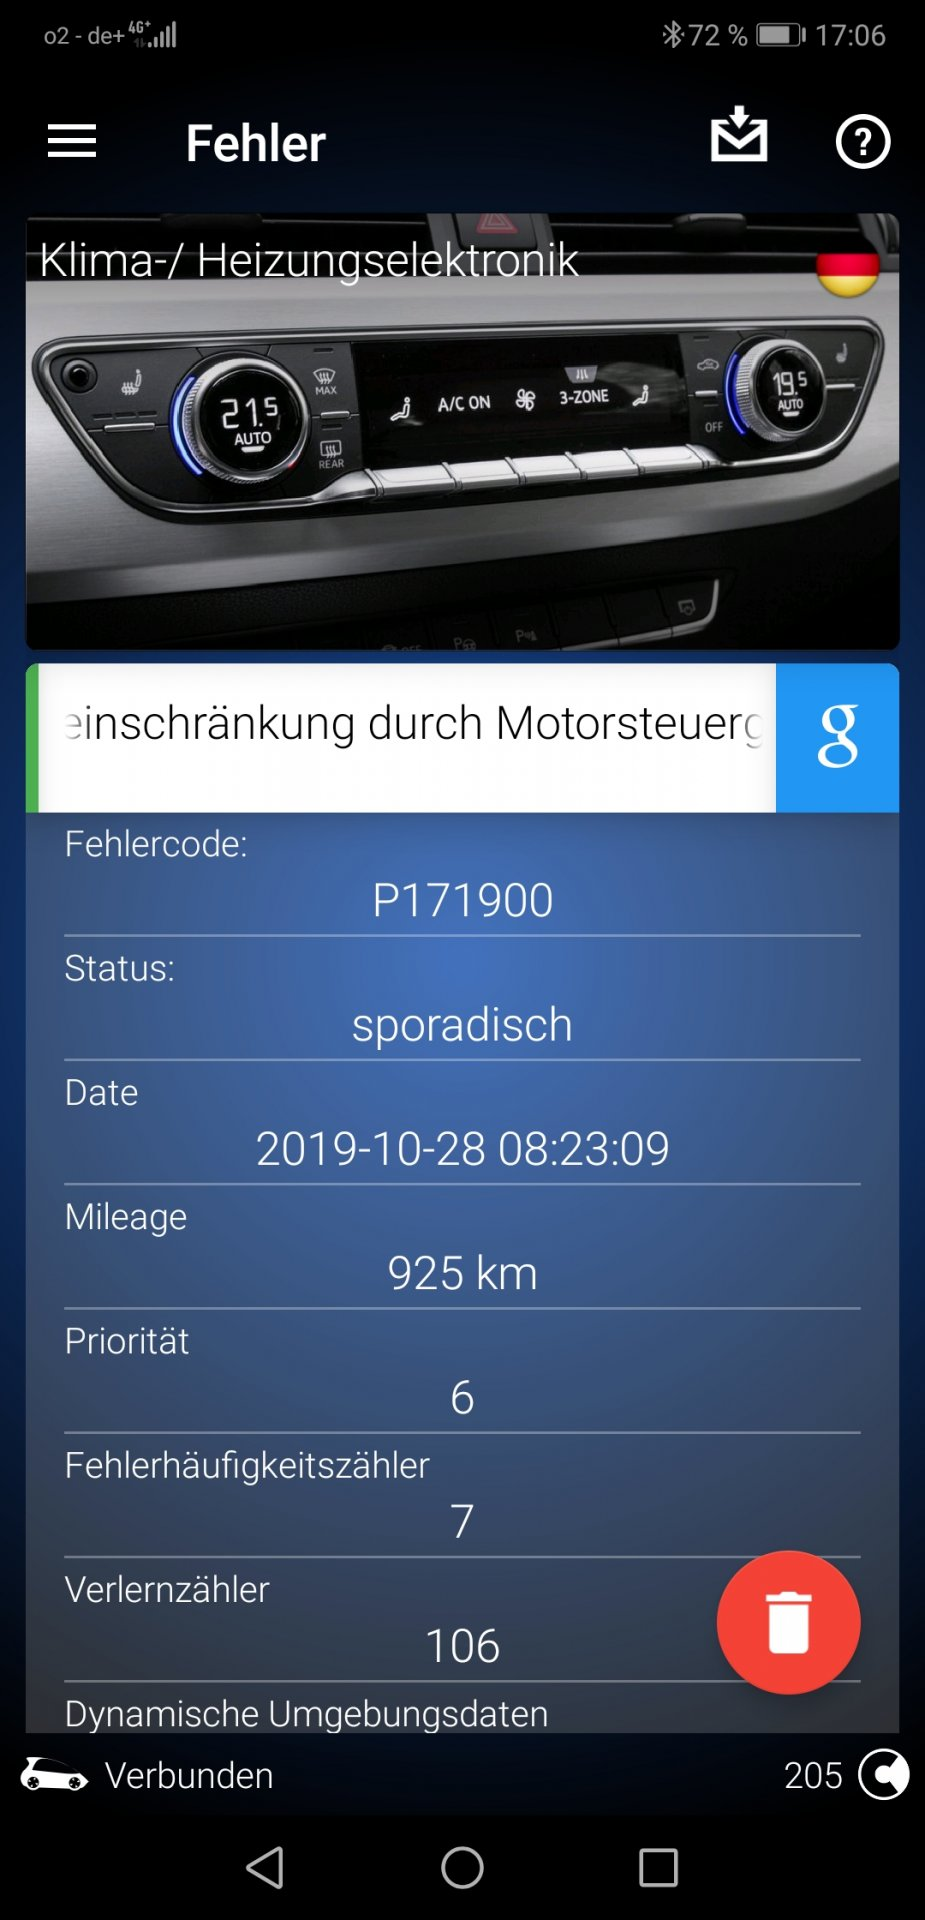 Screenshot_20191121_170650_com.voltasit.obdeleven.jpg